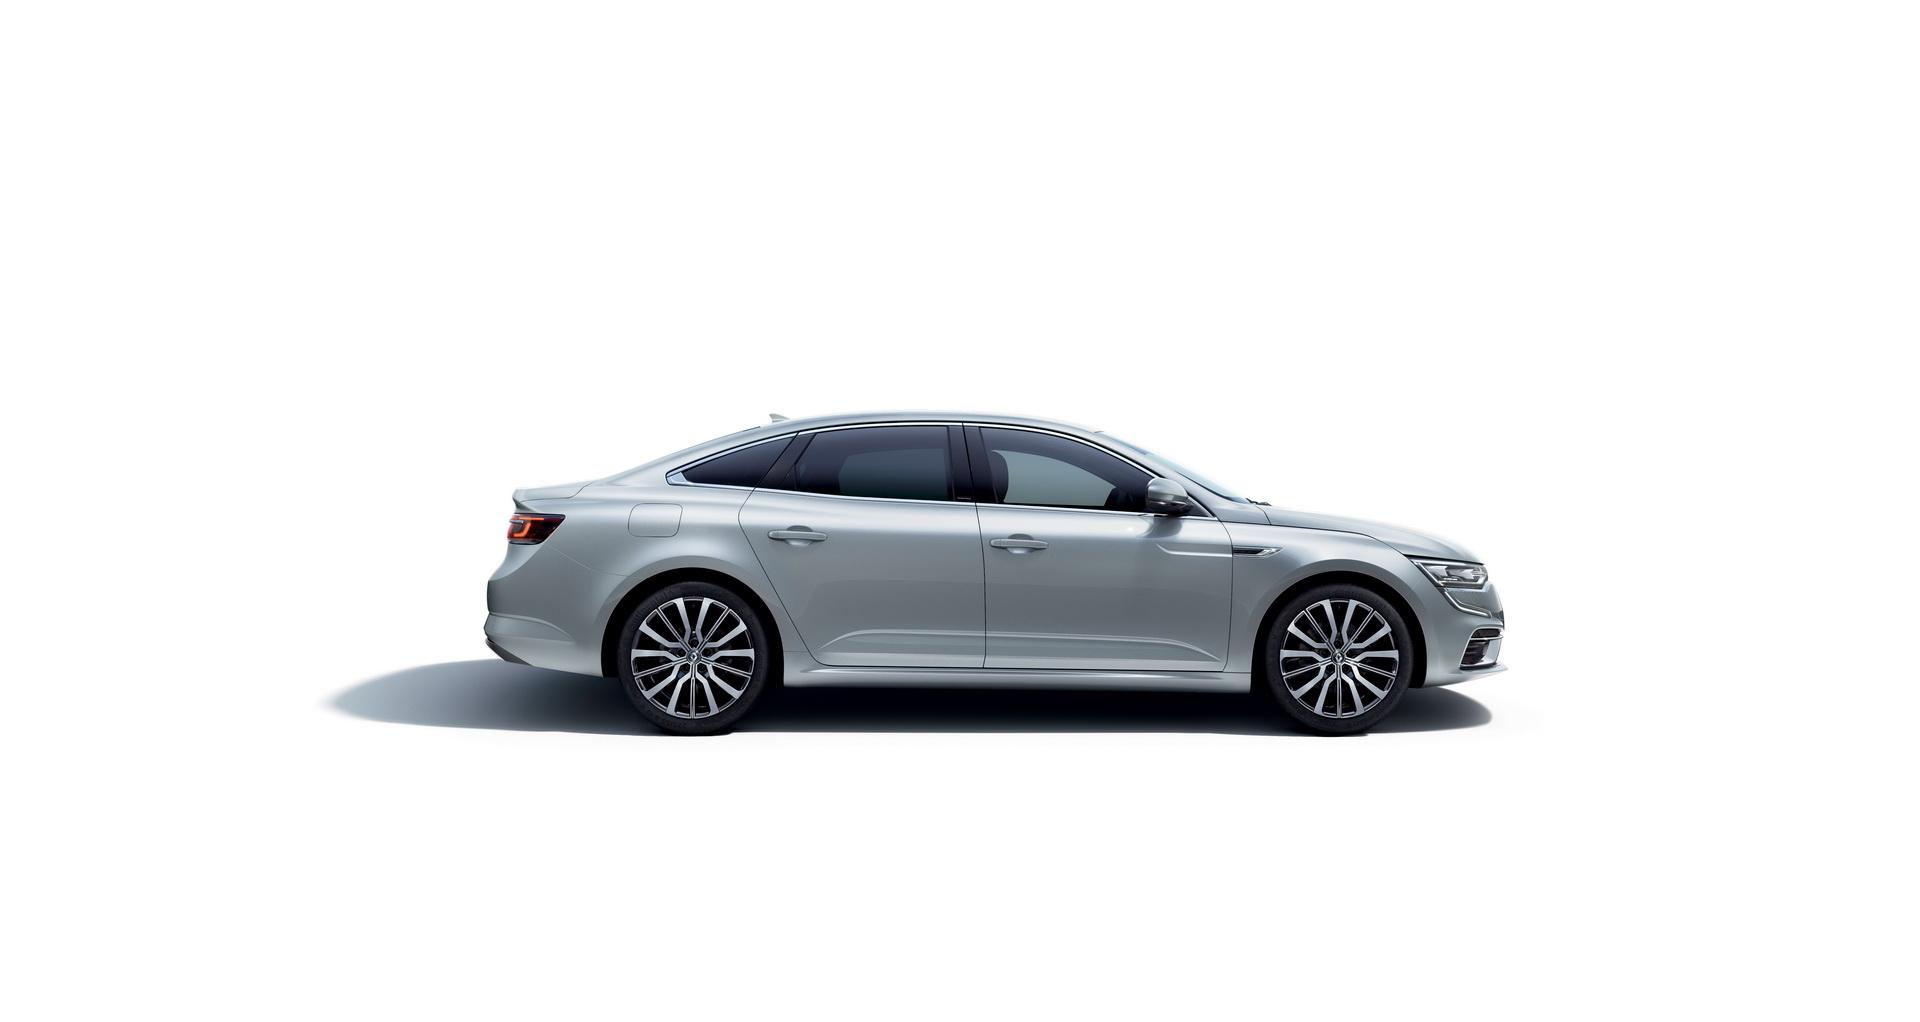 Renault-Talisman-facelift-2020-13